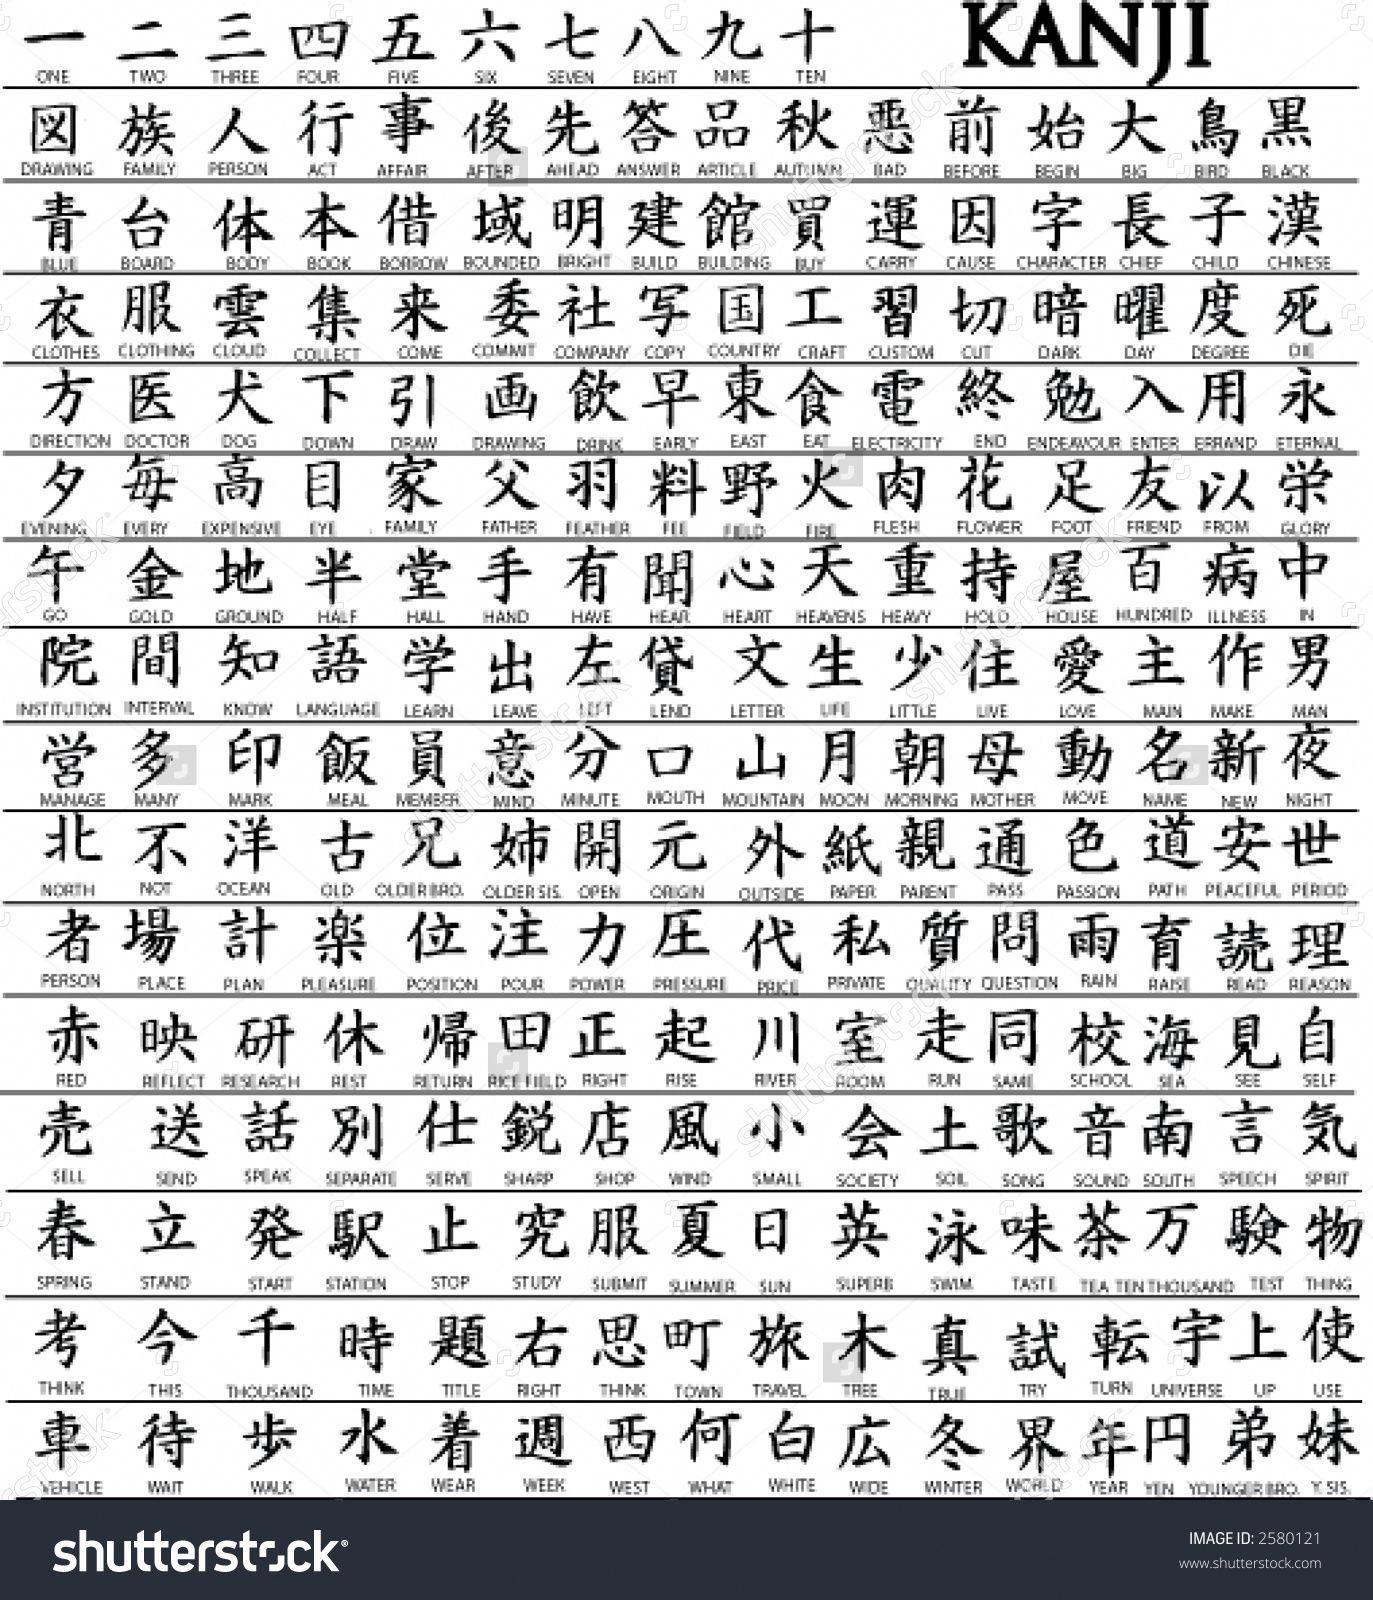 List of 20 kanji with translation  Learn Japanese & how to write